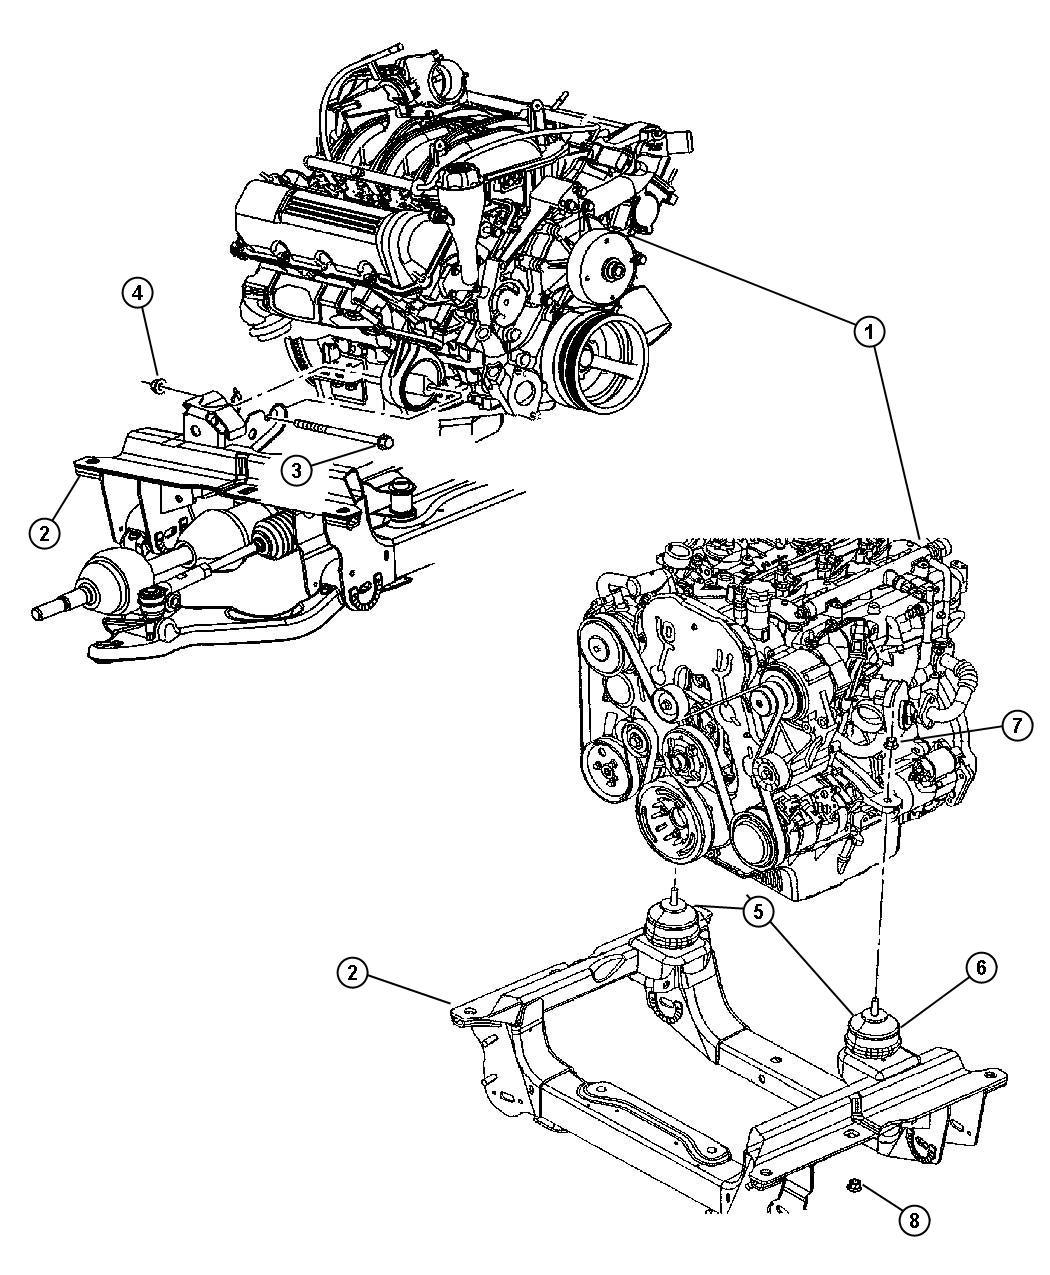 2006 Jeep Liberty Insulator. Engine mount. Shield, mounts